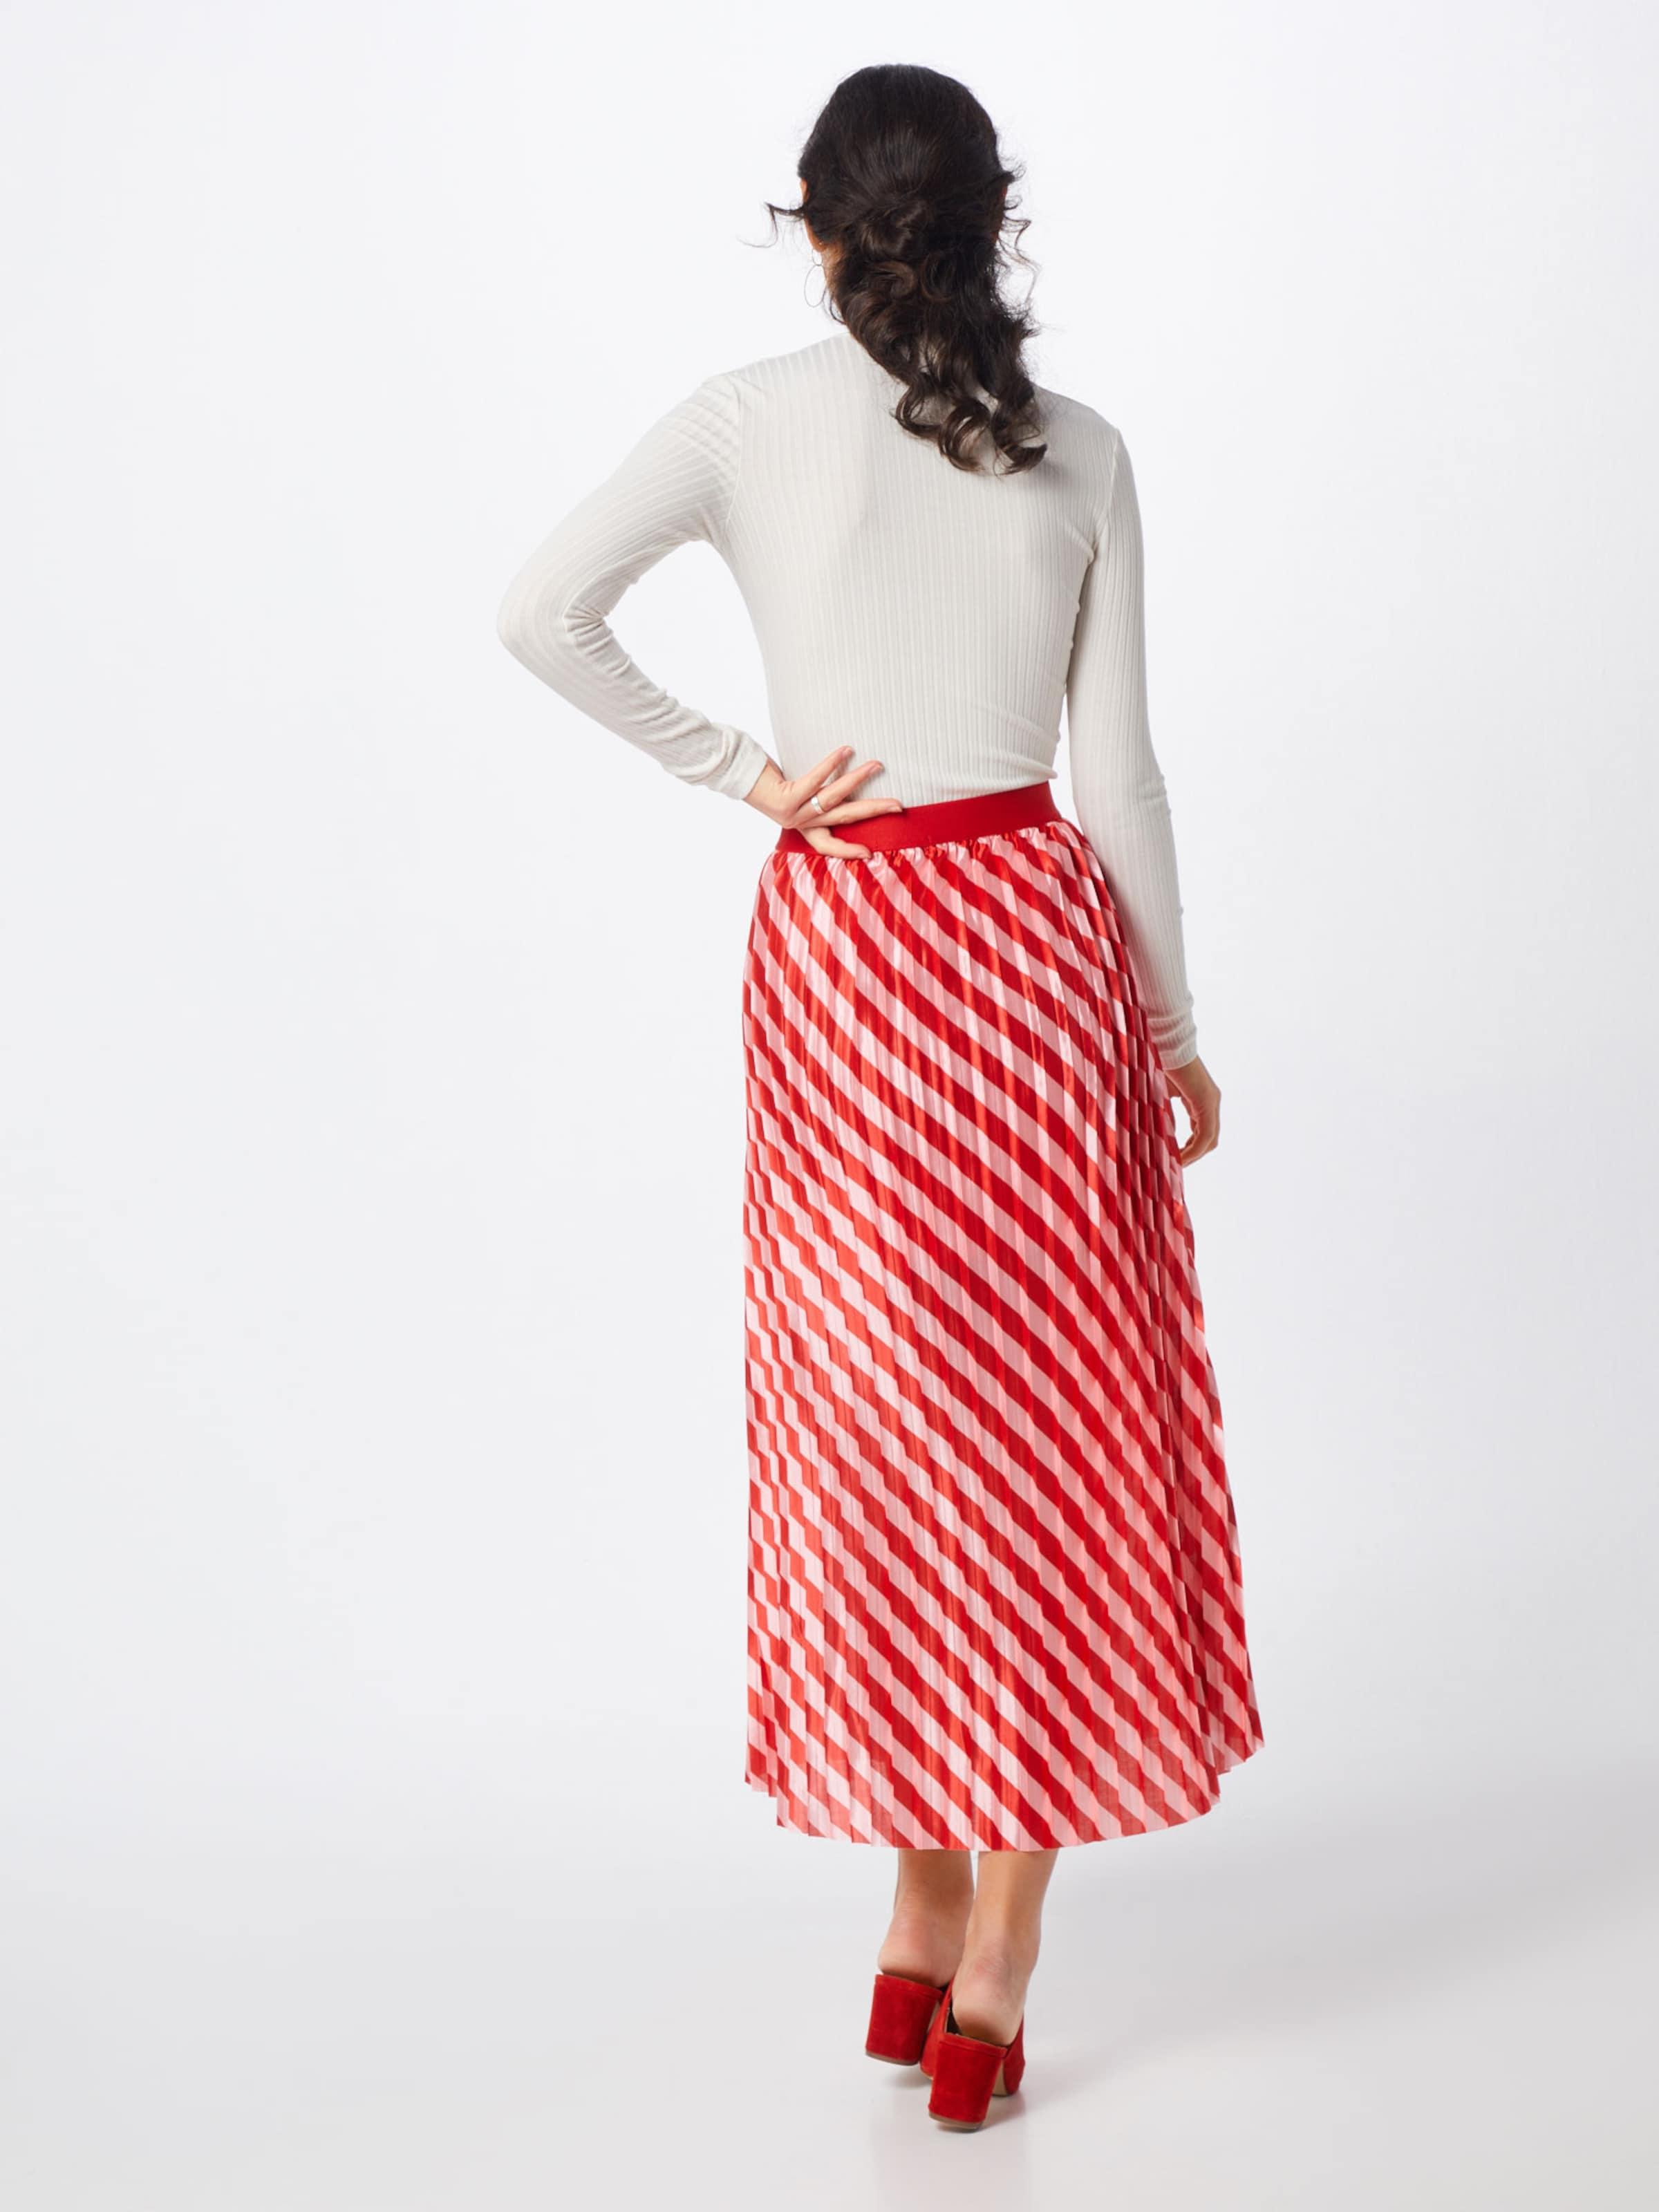 RougeBlanc Jupe In Skirt' Luxury Soaked En 'jasmine FculKT1J53